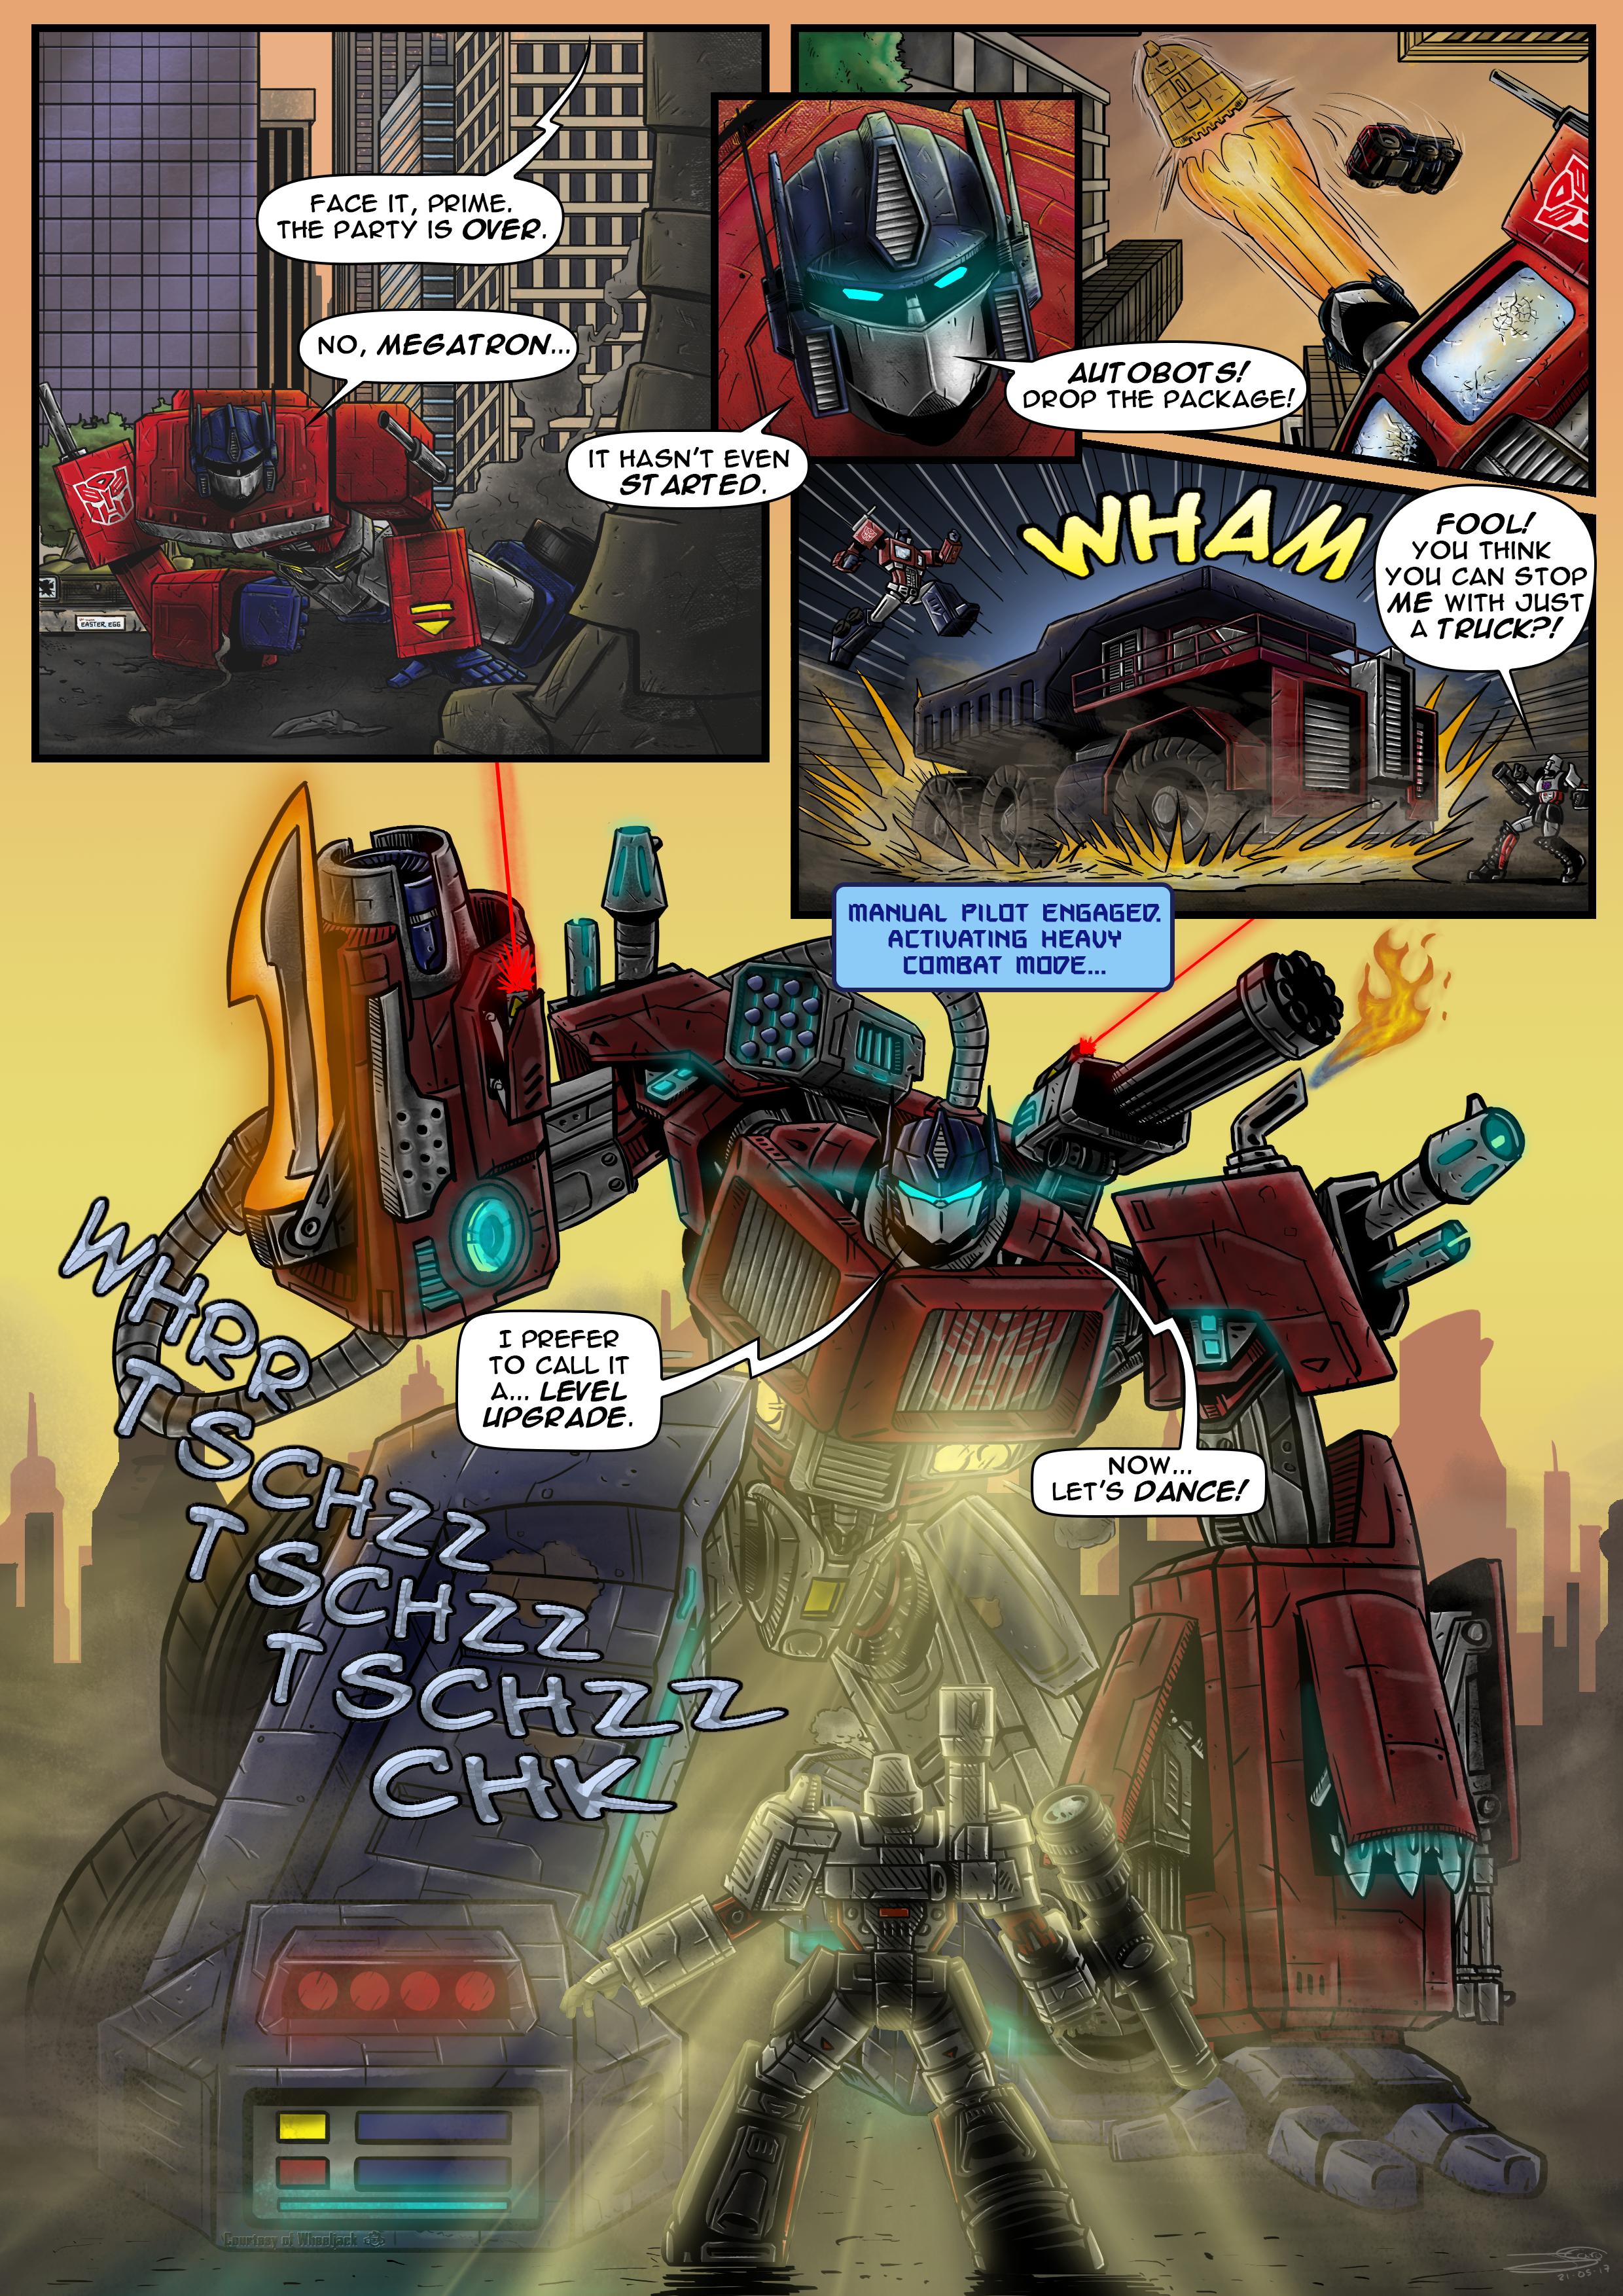 Optimus Prime LVL 99